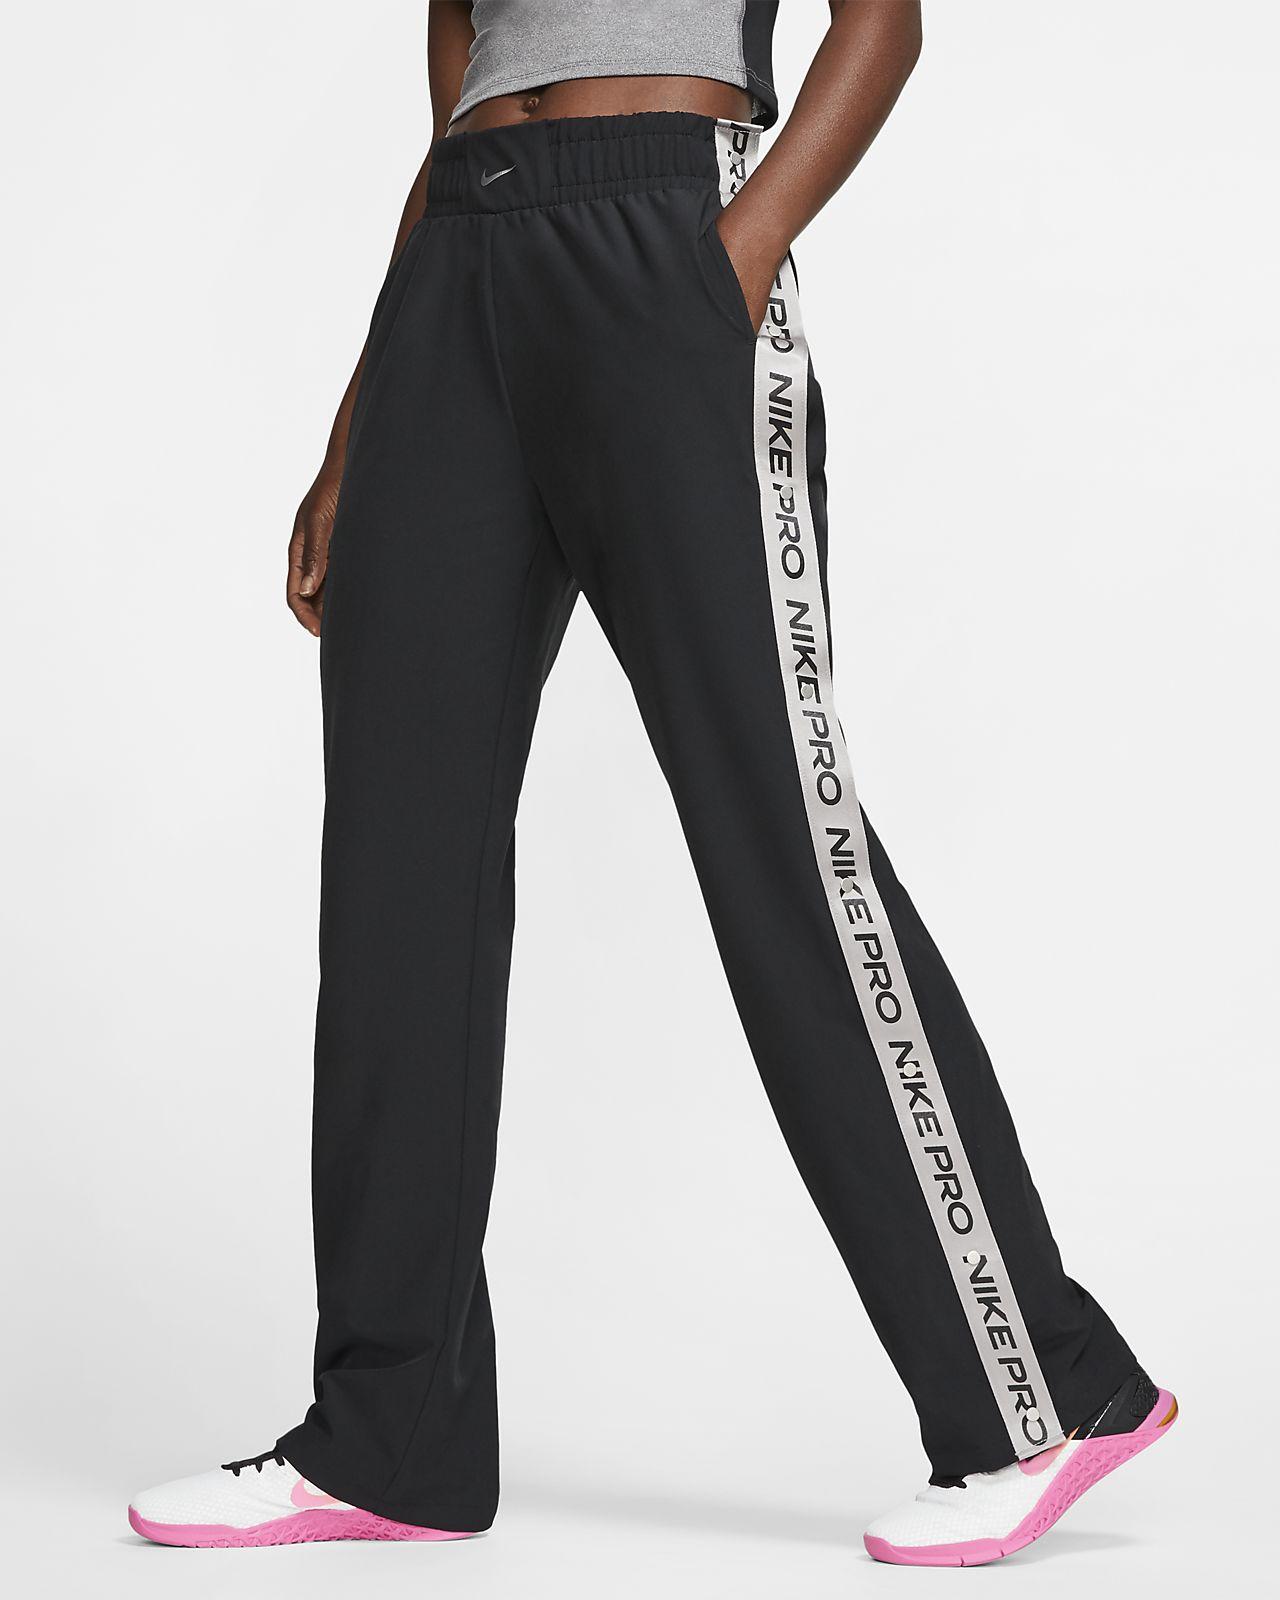 Nike Pro Pantalons amb disseny separable - Dona